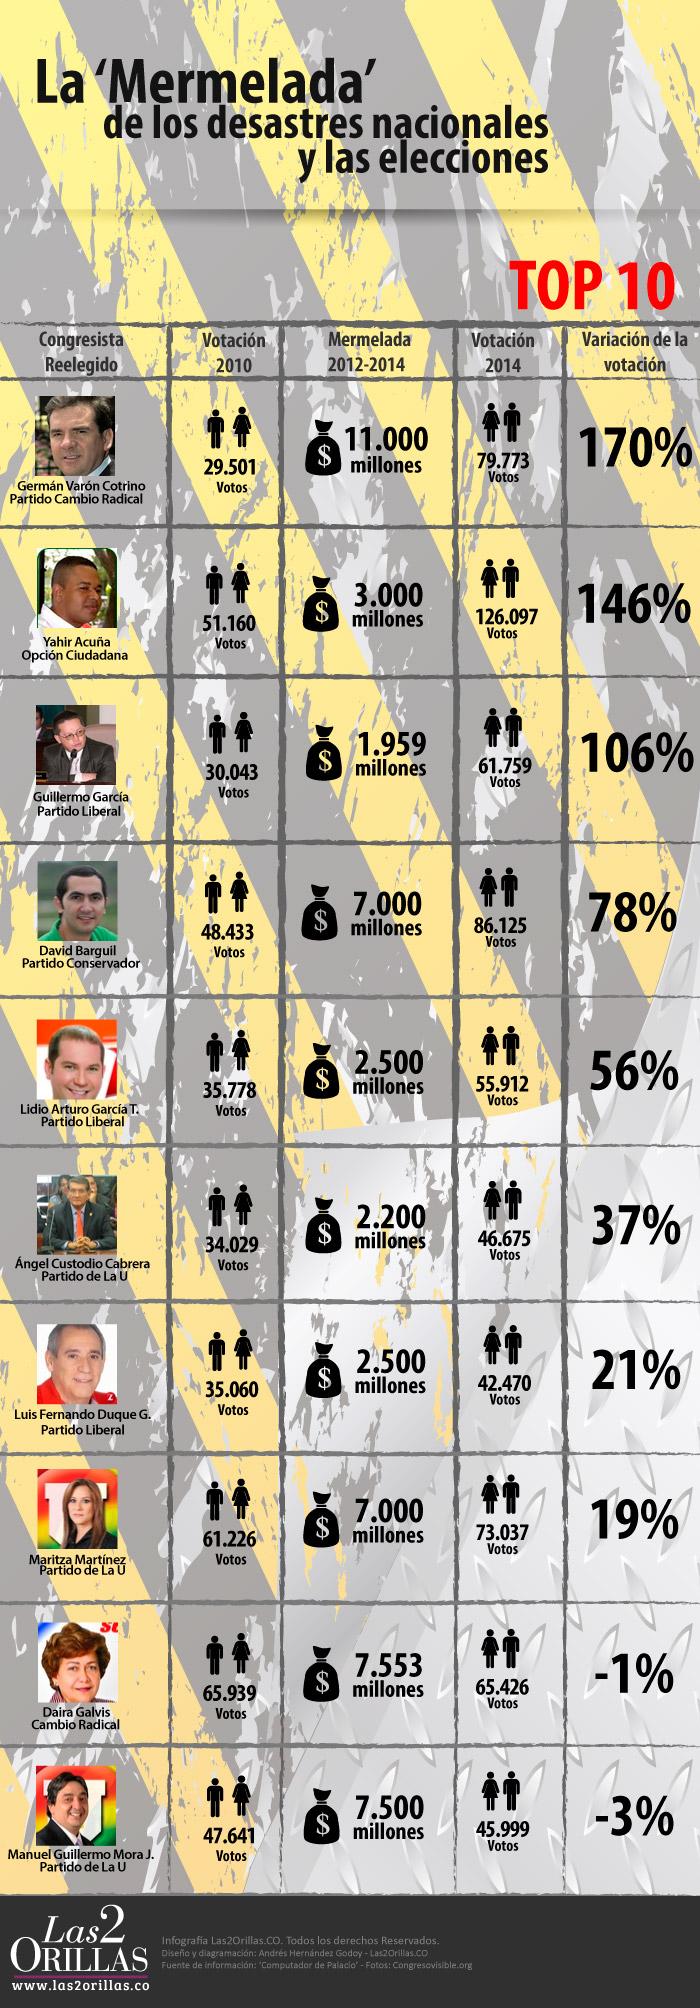 Infografia-Mermelada-Desastres-Nacionales (1)